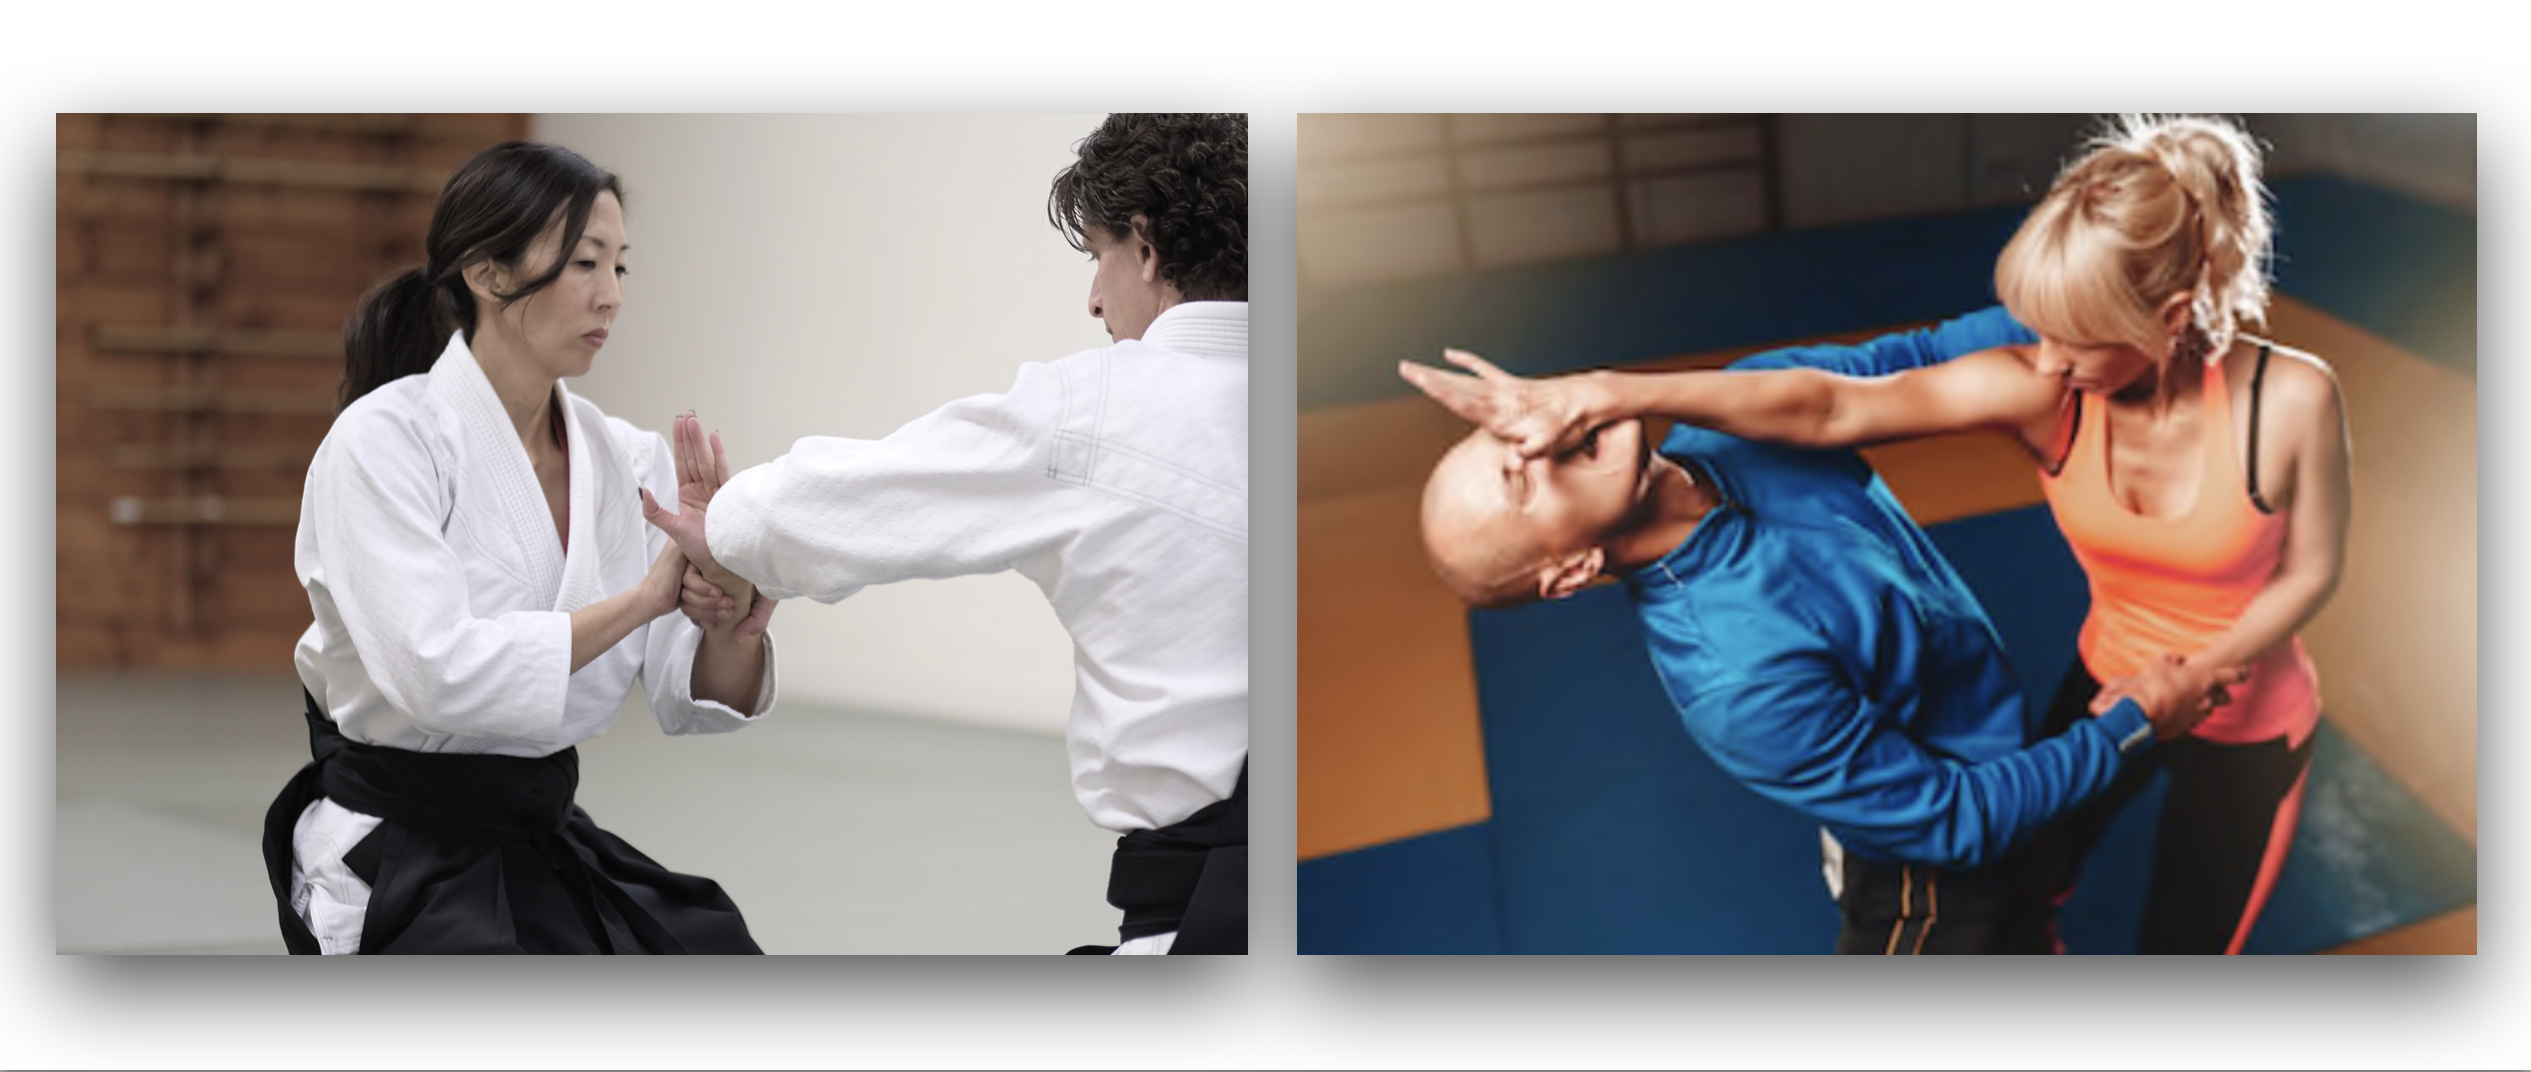 Aikido's Branding Problem: Will Aikido Become the Kodak of